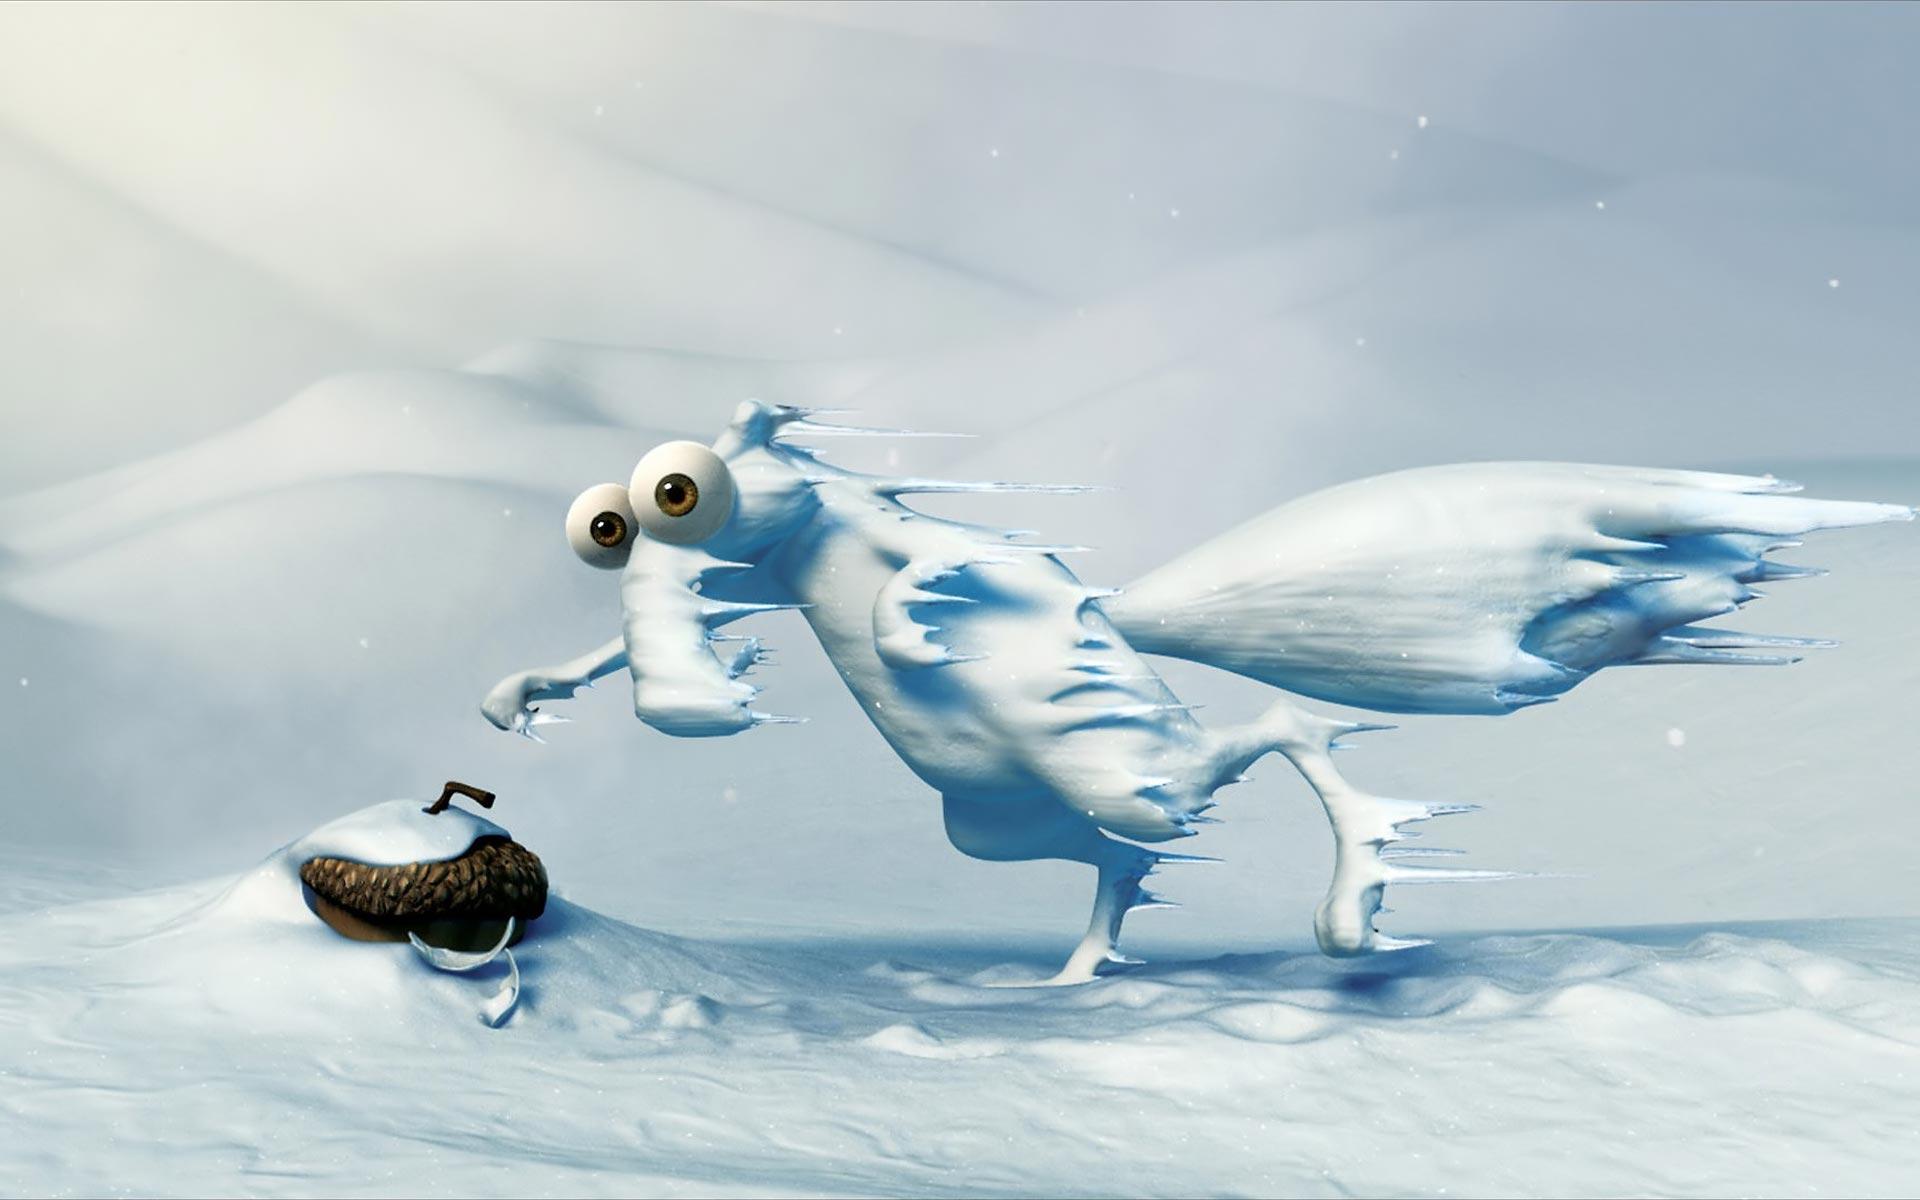 Коротко о погоде картинки приколы мороз, открытка добрым утром